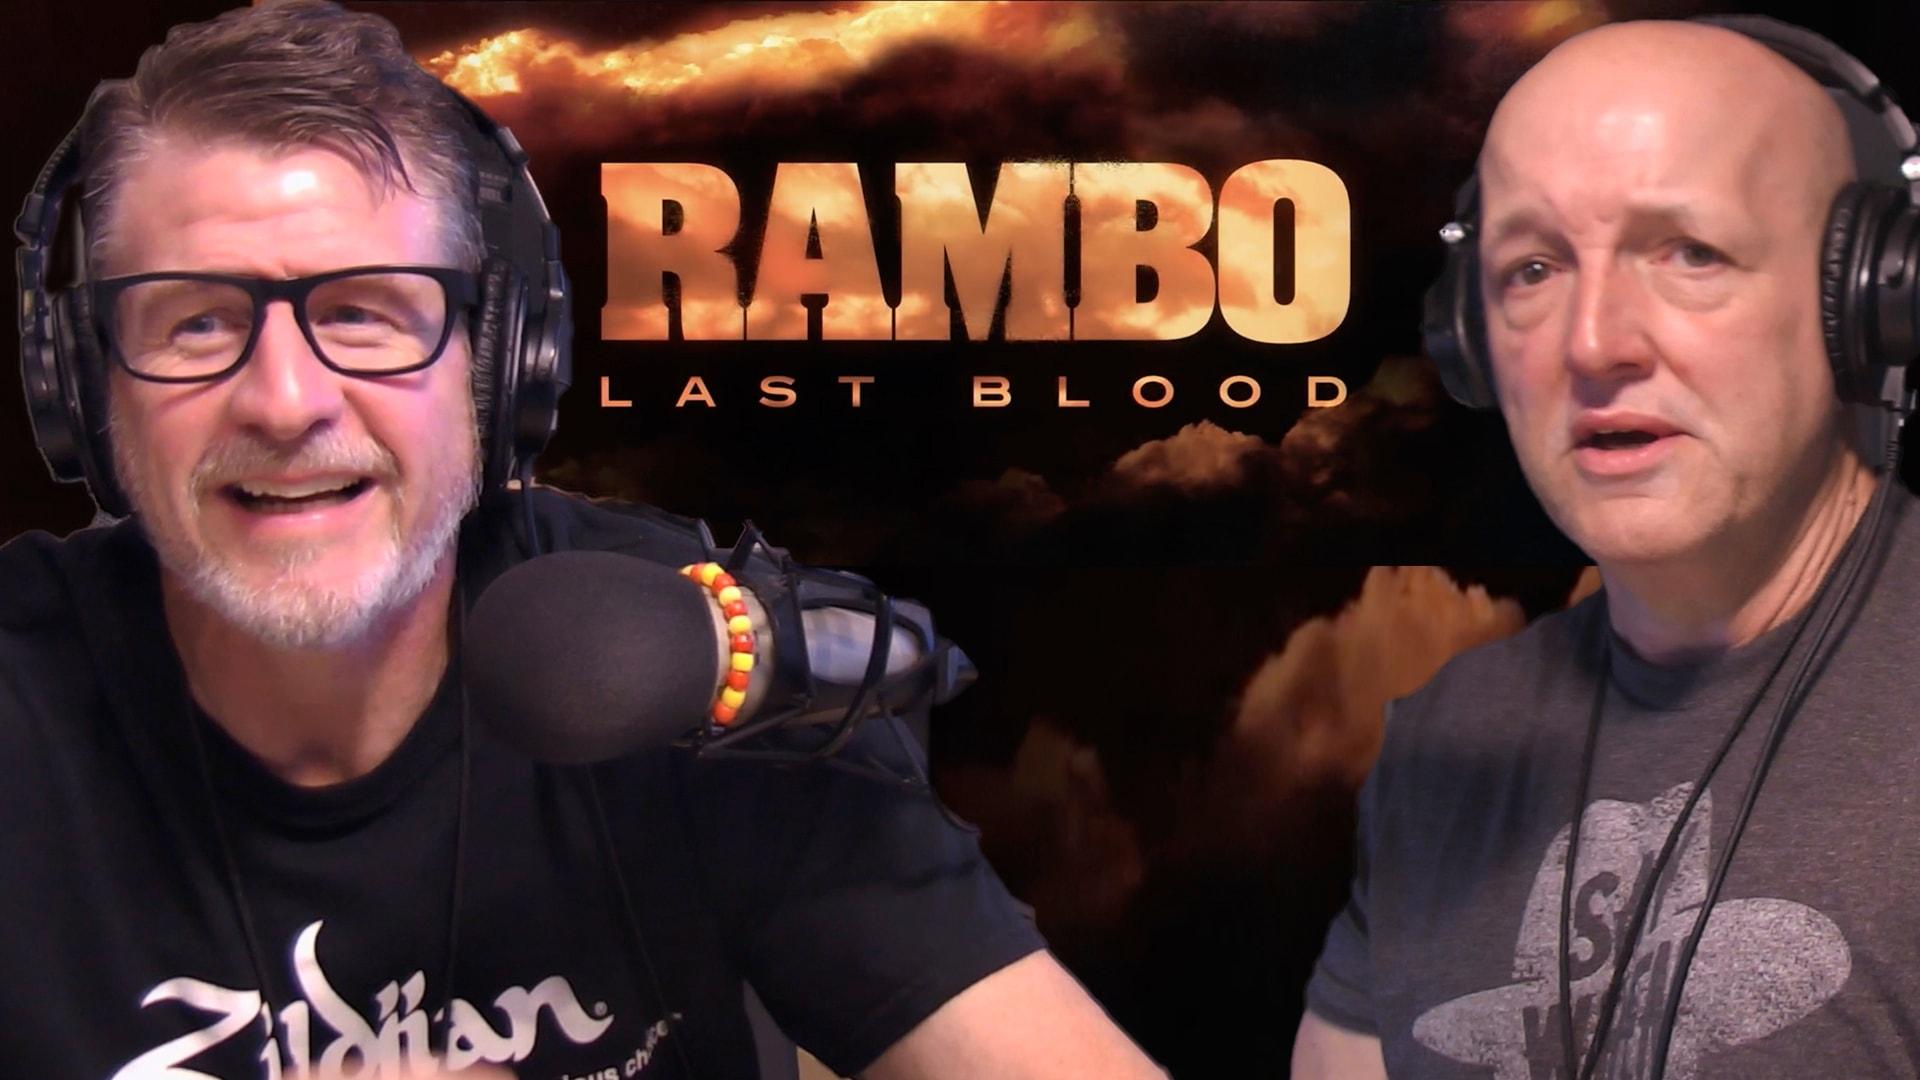 P&S React To The New Rambo Movie